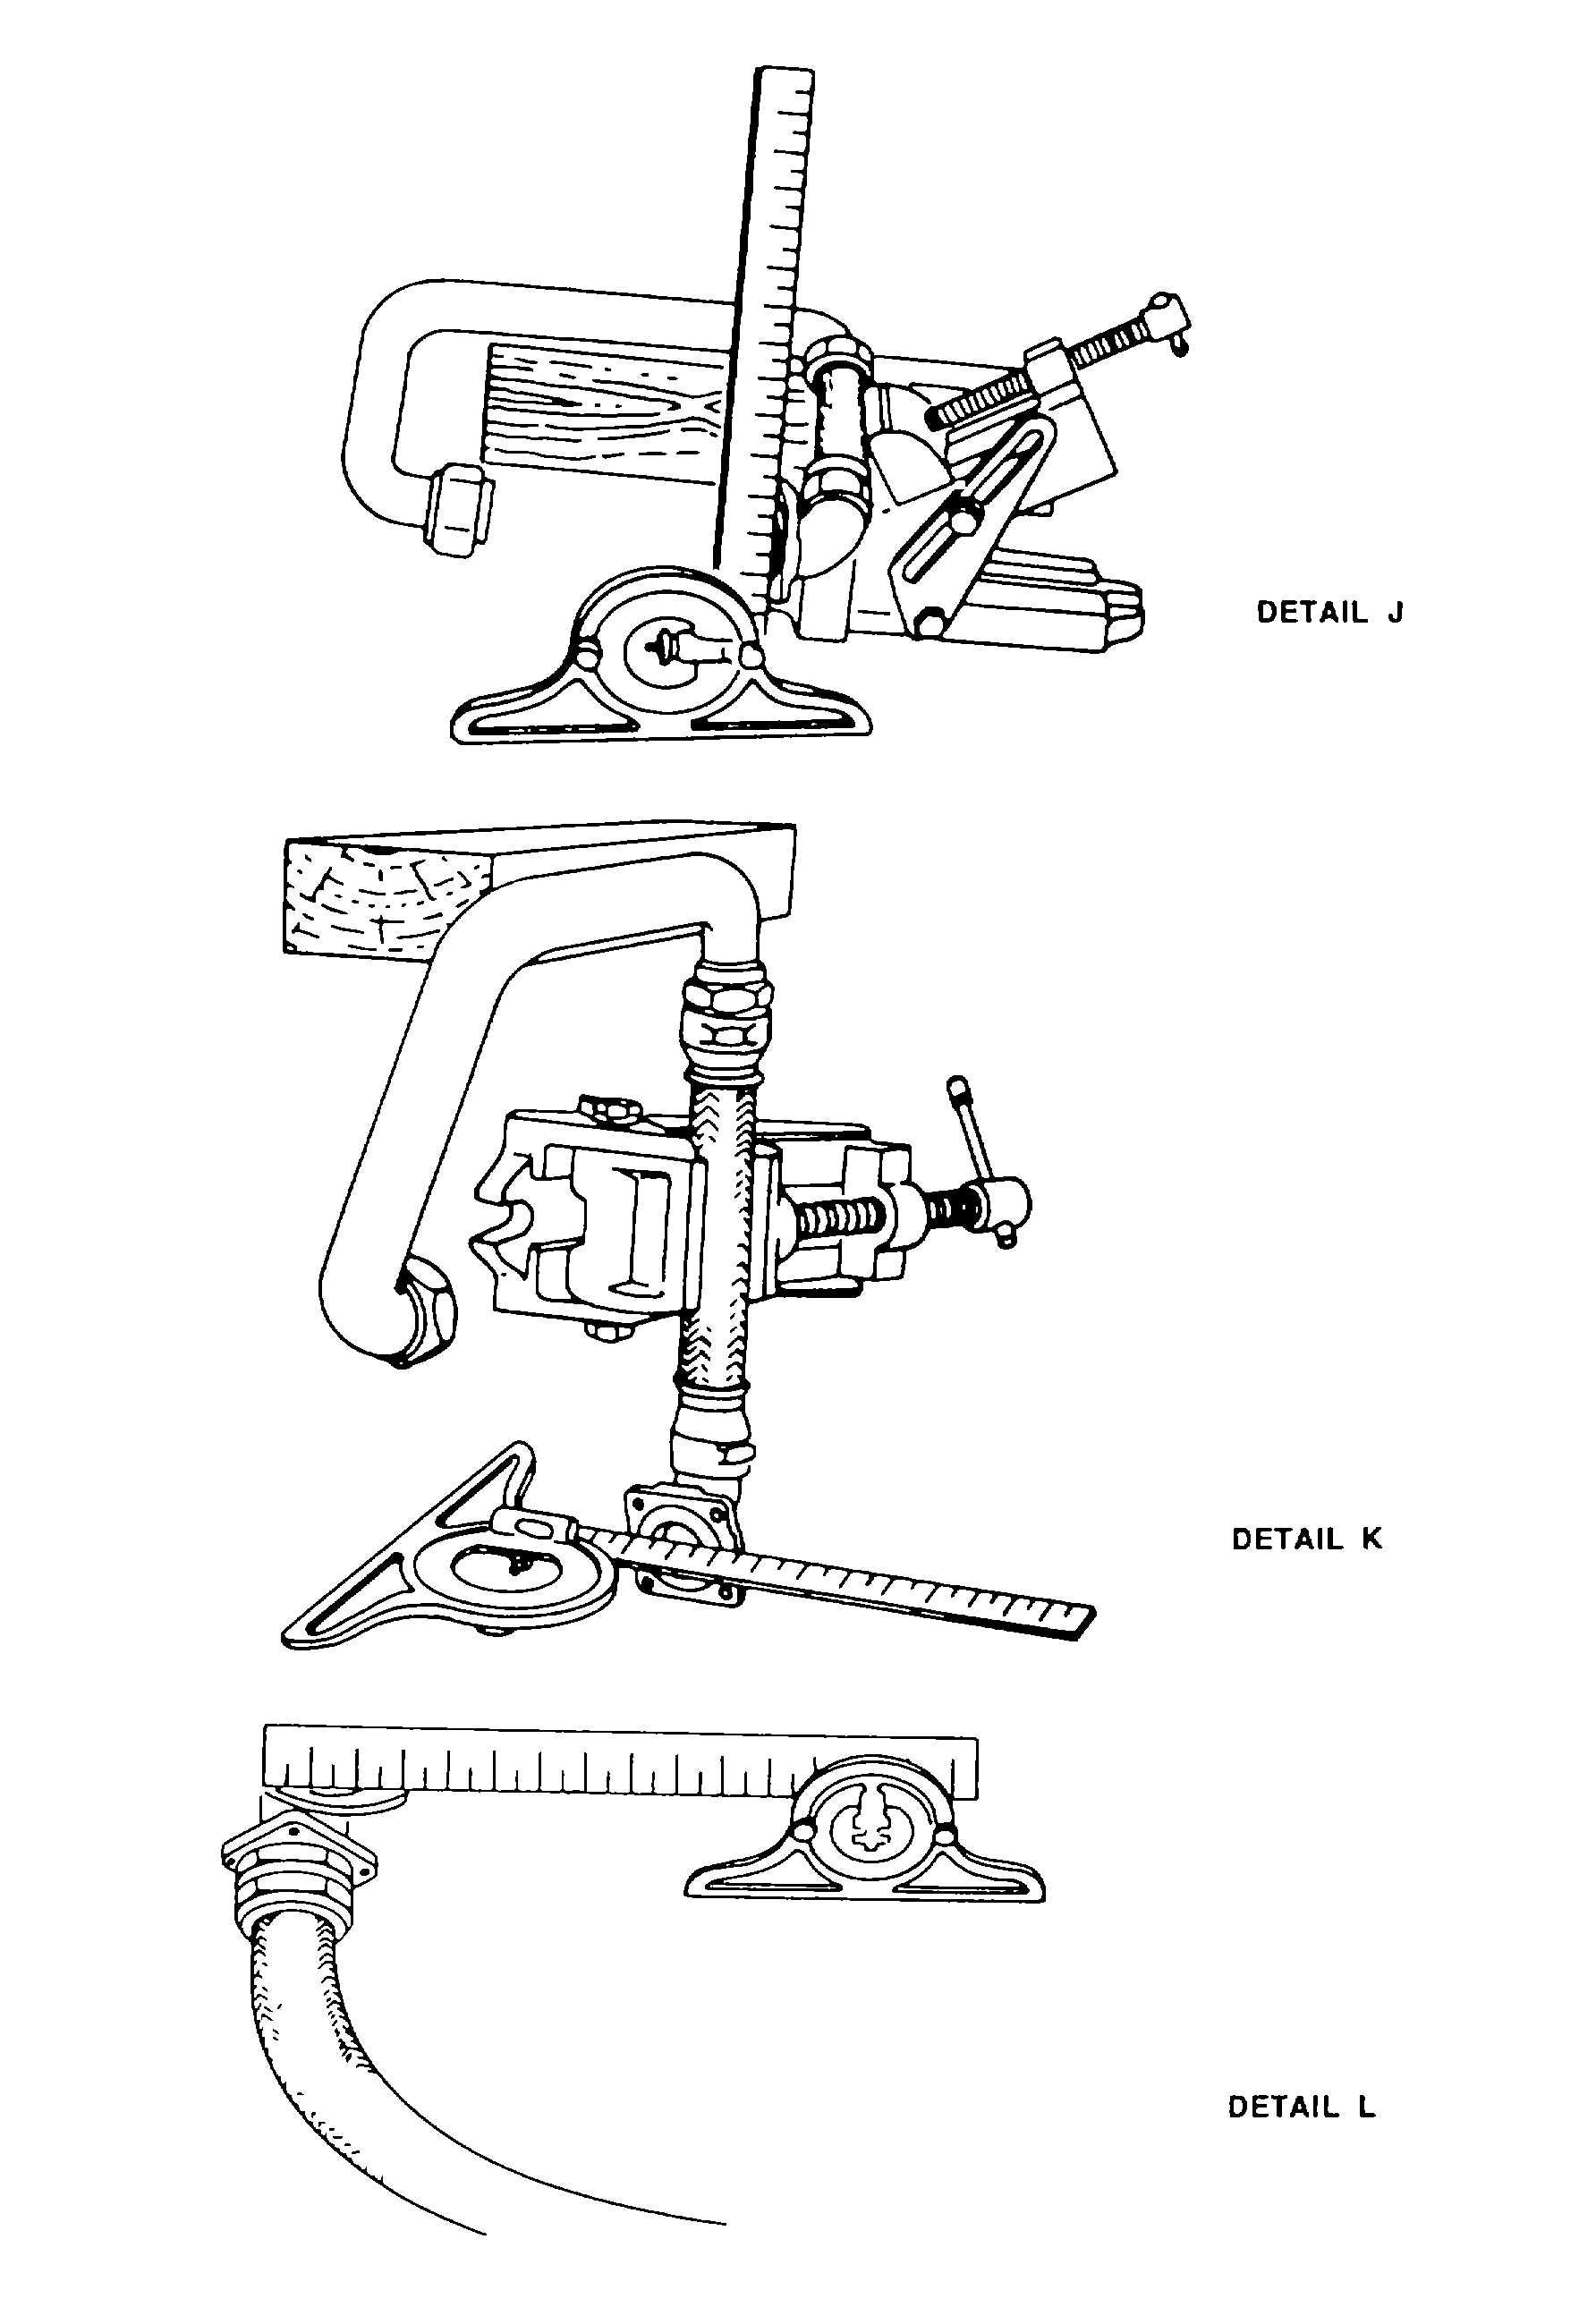 Figure 4-48. Medium-Pressure Teflon Hose Assembly